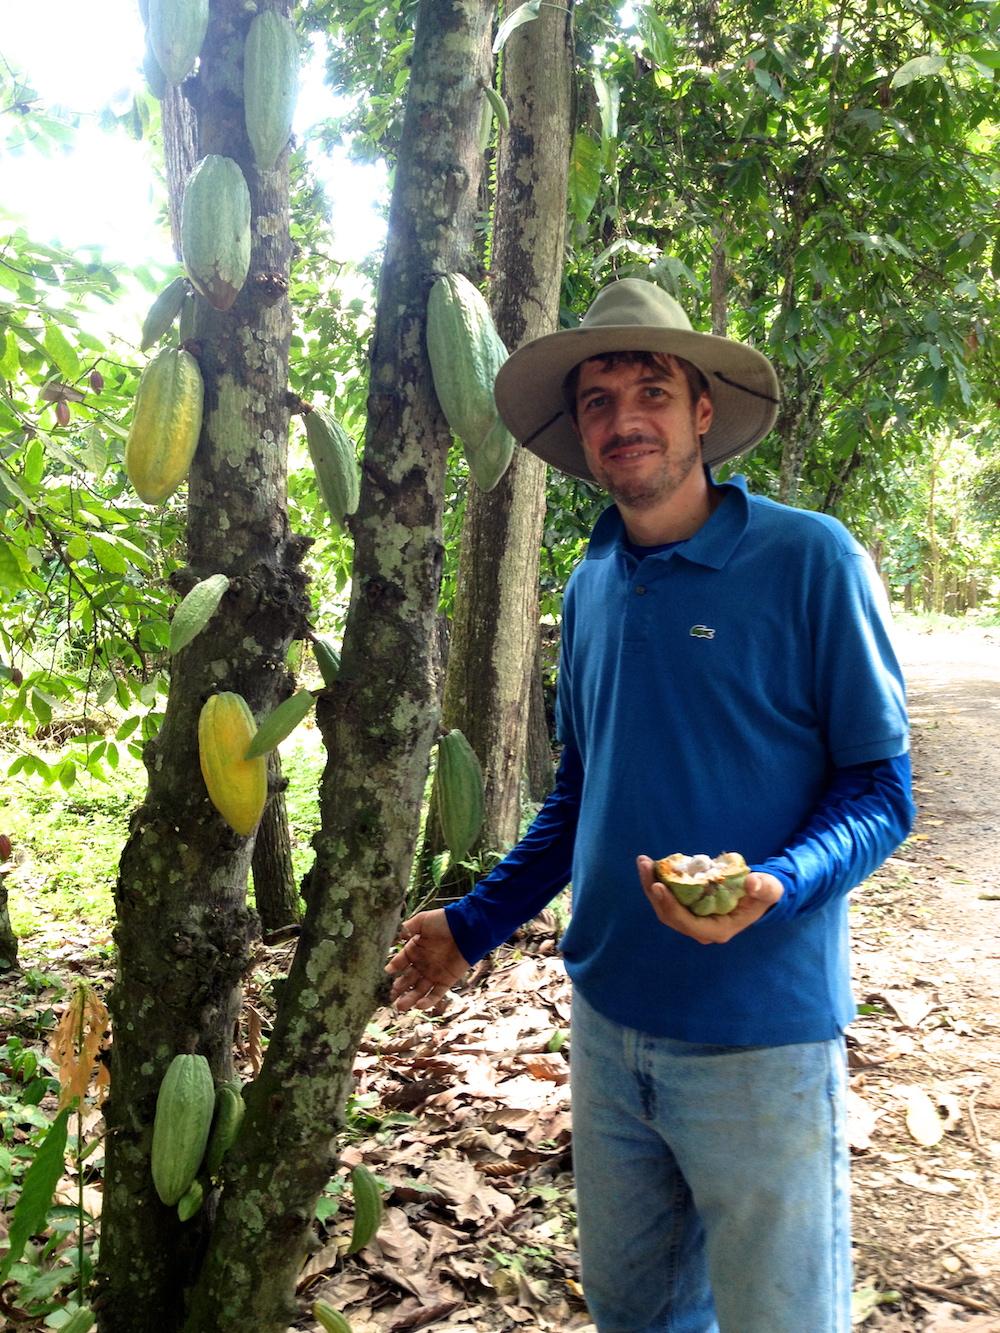 Farm manager Vicente Norero at Camino Verde farm in Ecuador. Image credit Simran Sethi